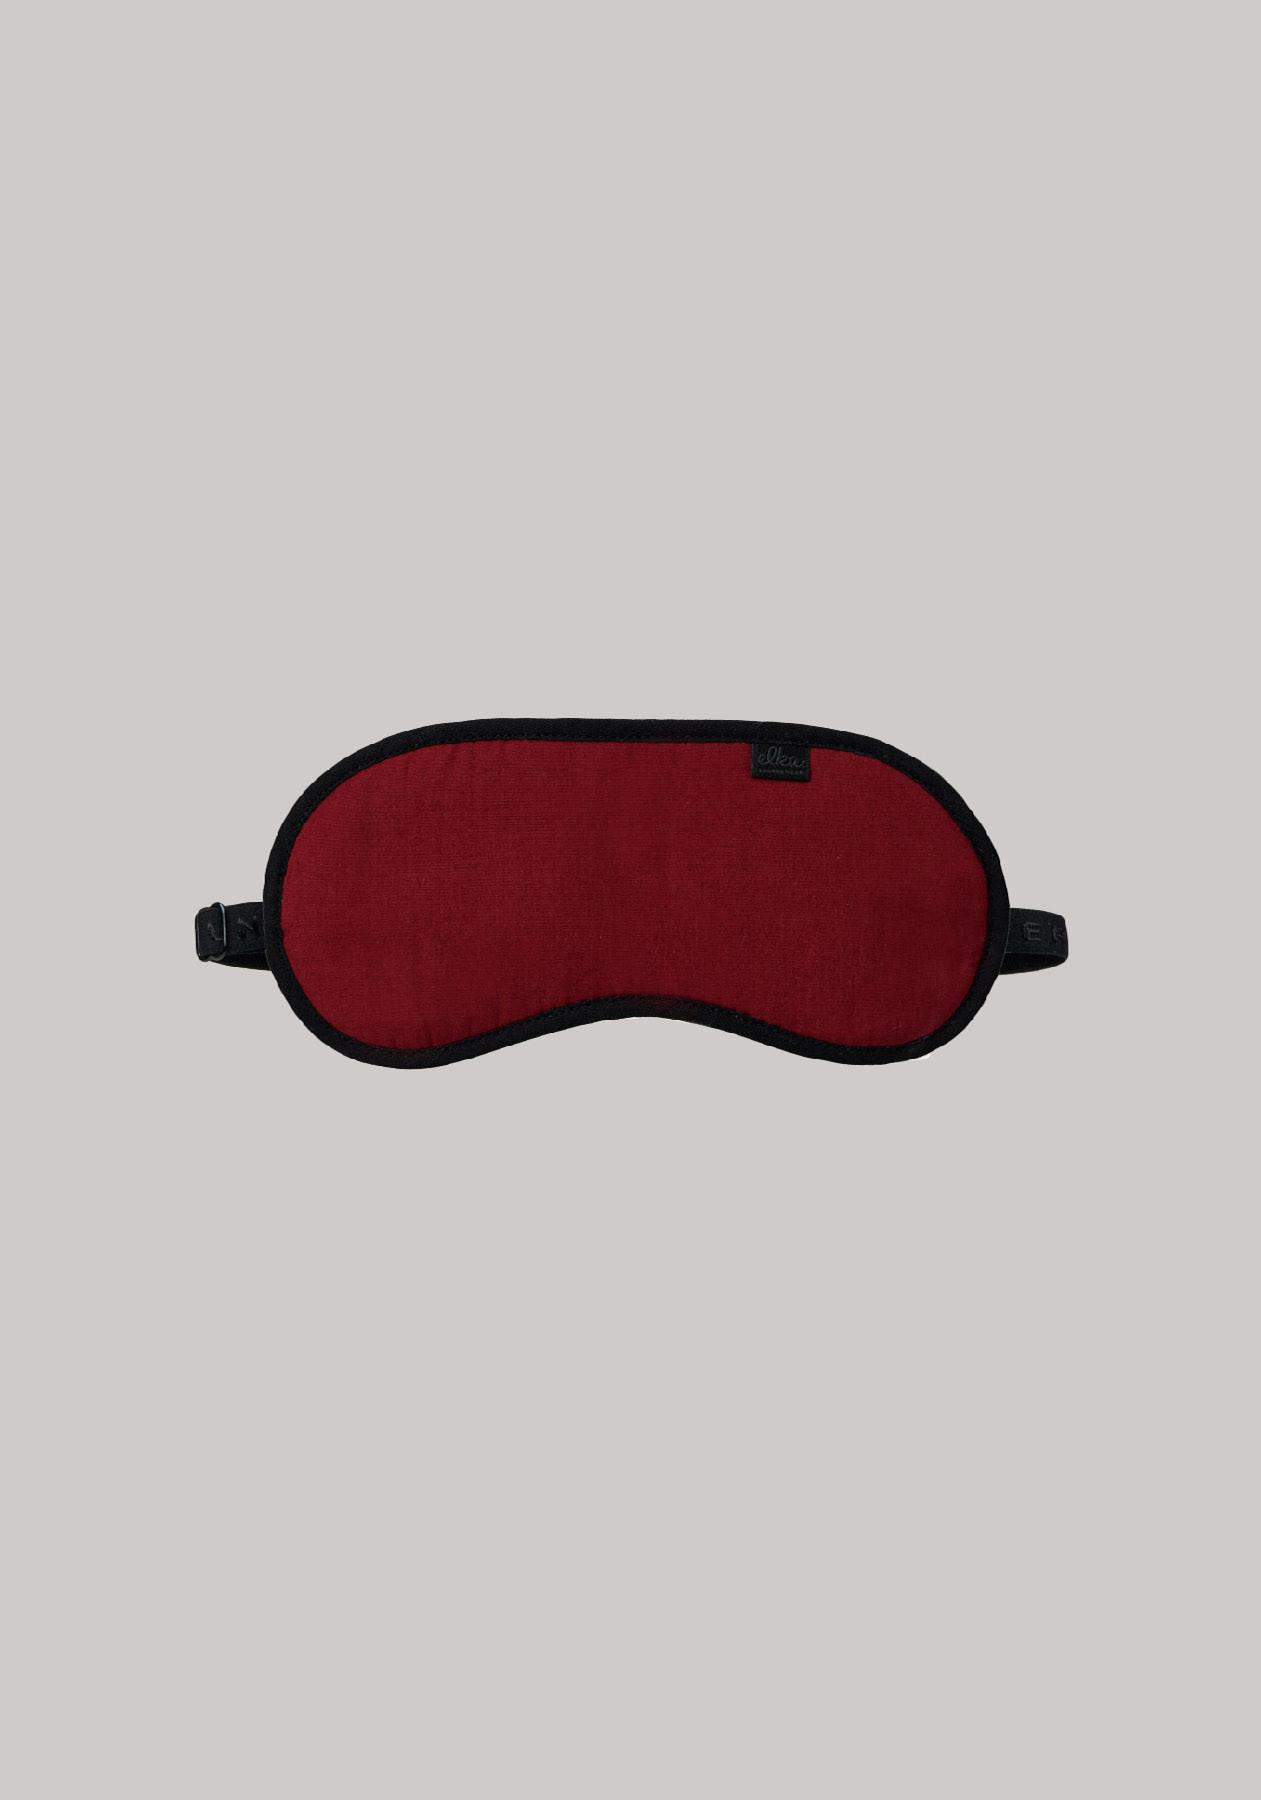 Deco_Home-Sleepmasks-ELKA-Lounge-H00587